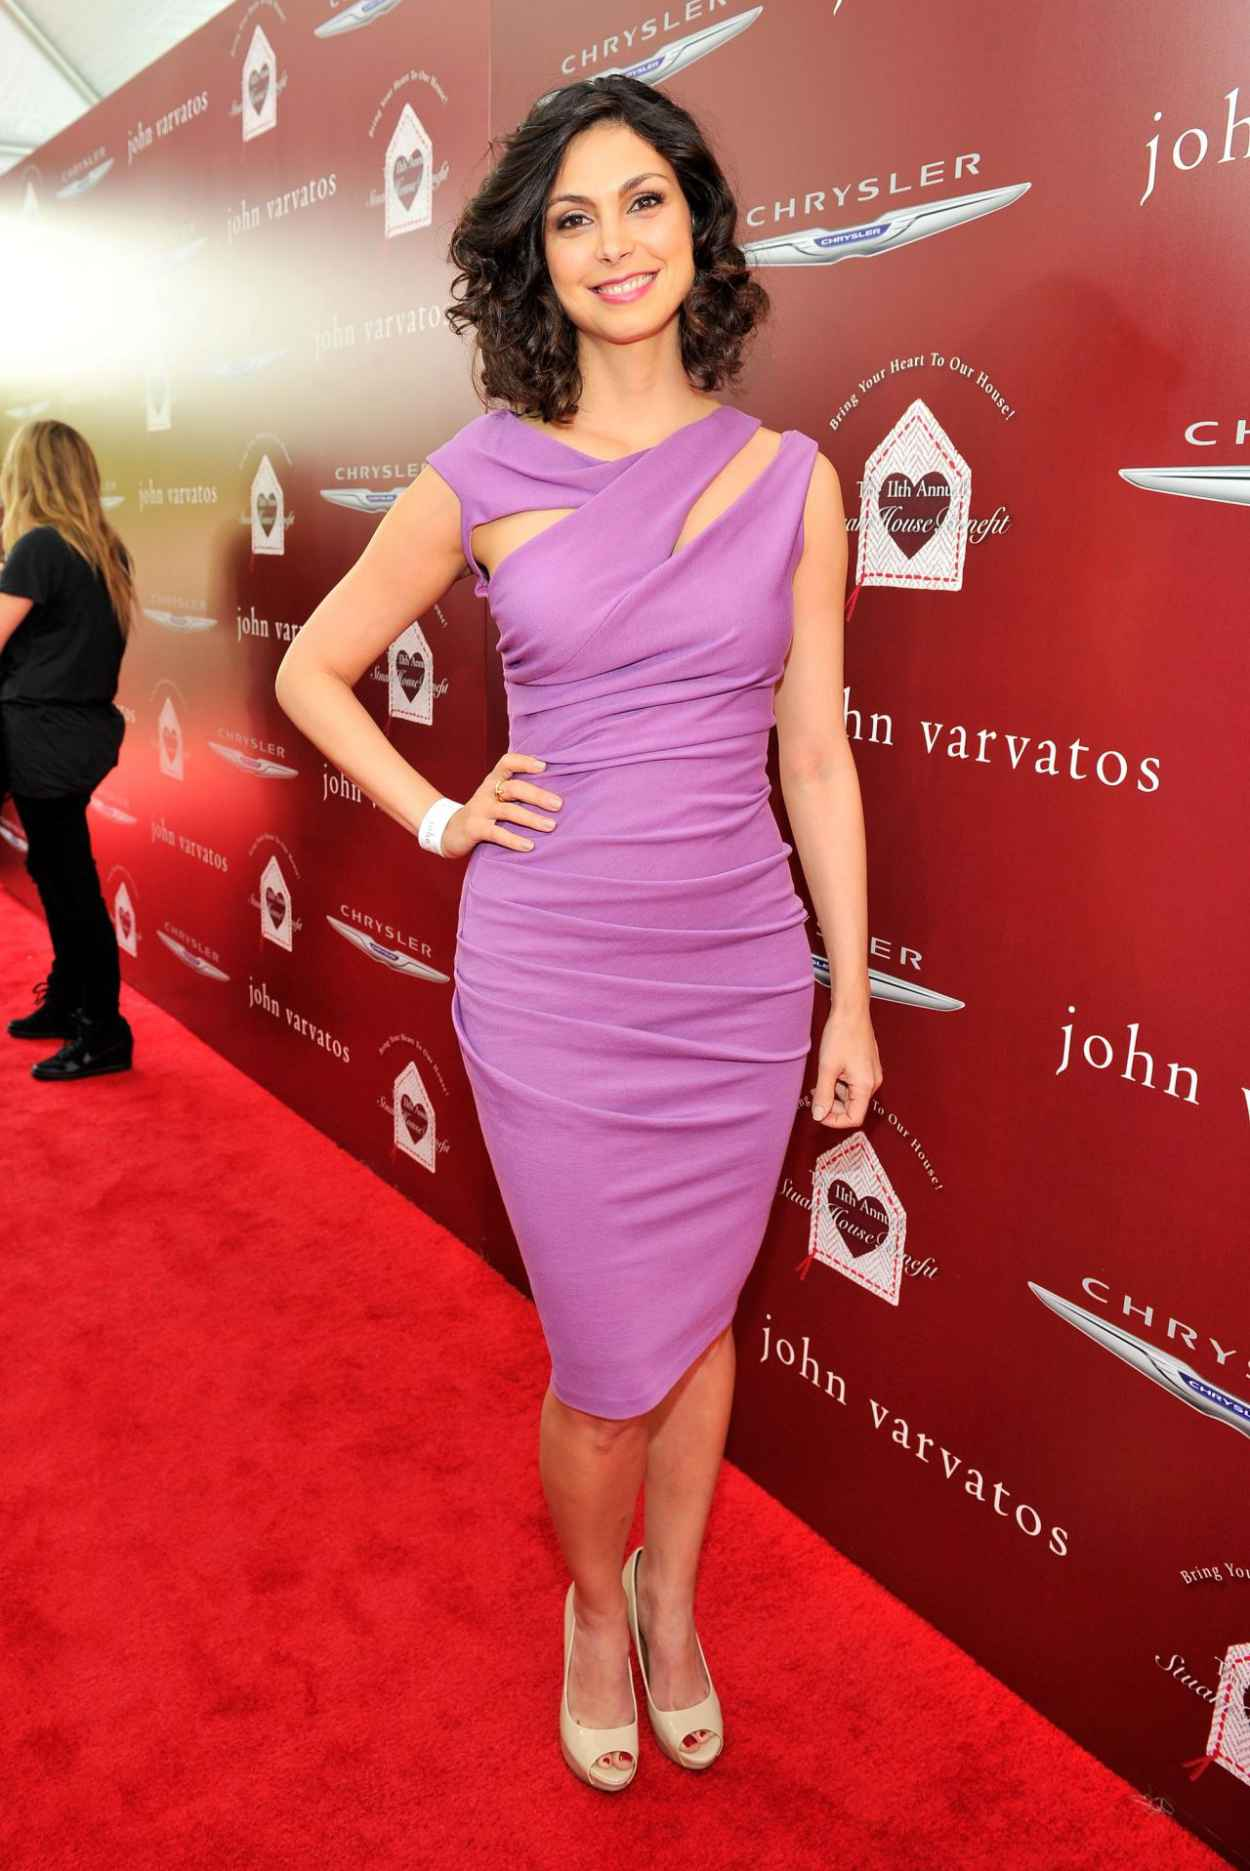 Morena Baccarin Wearing Kevan Hall Jersey Dress - 2015 John Varvatos Stuart House Benefit in West Hollywood-1